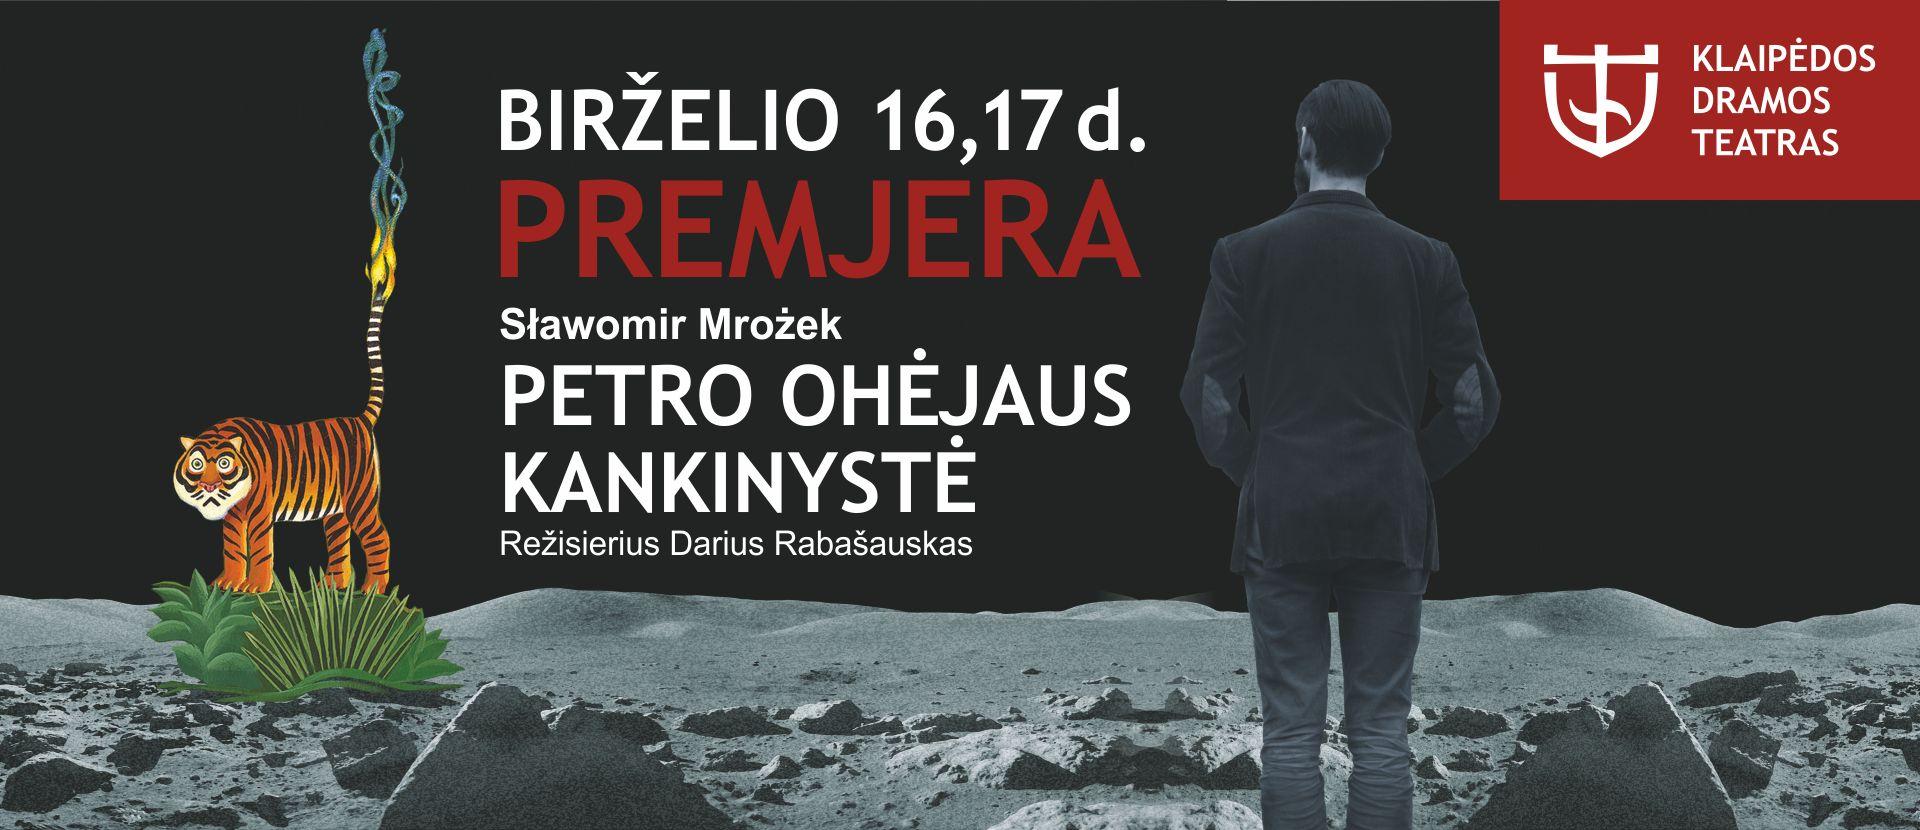 "Sławomir Mrożek ""Petro Ohėjaus kankinystė"", 1 dalies spektaklis"